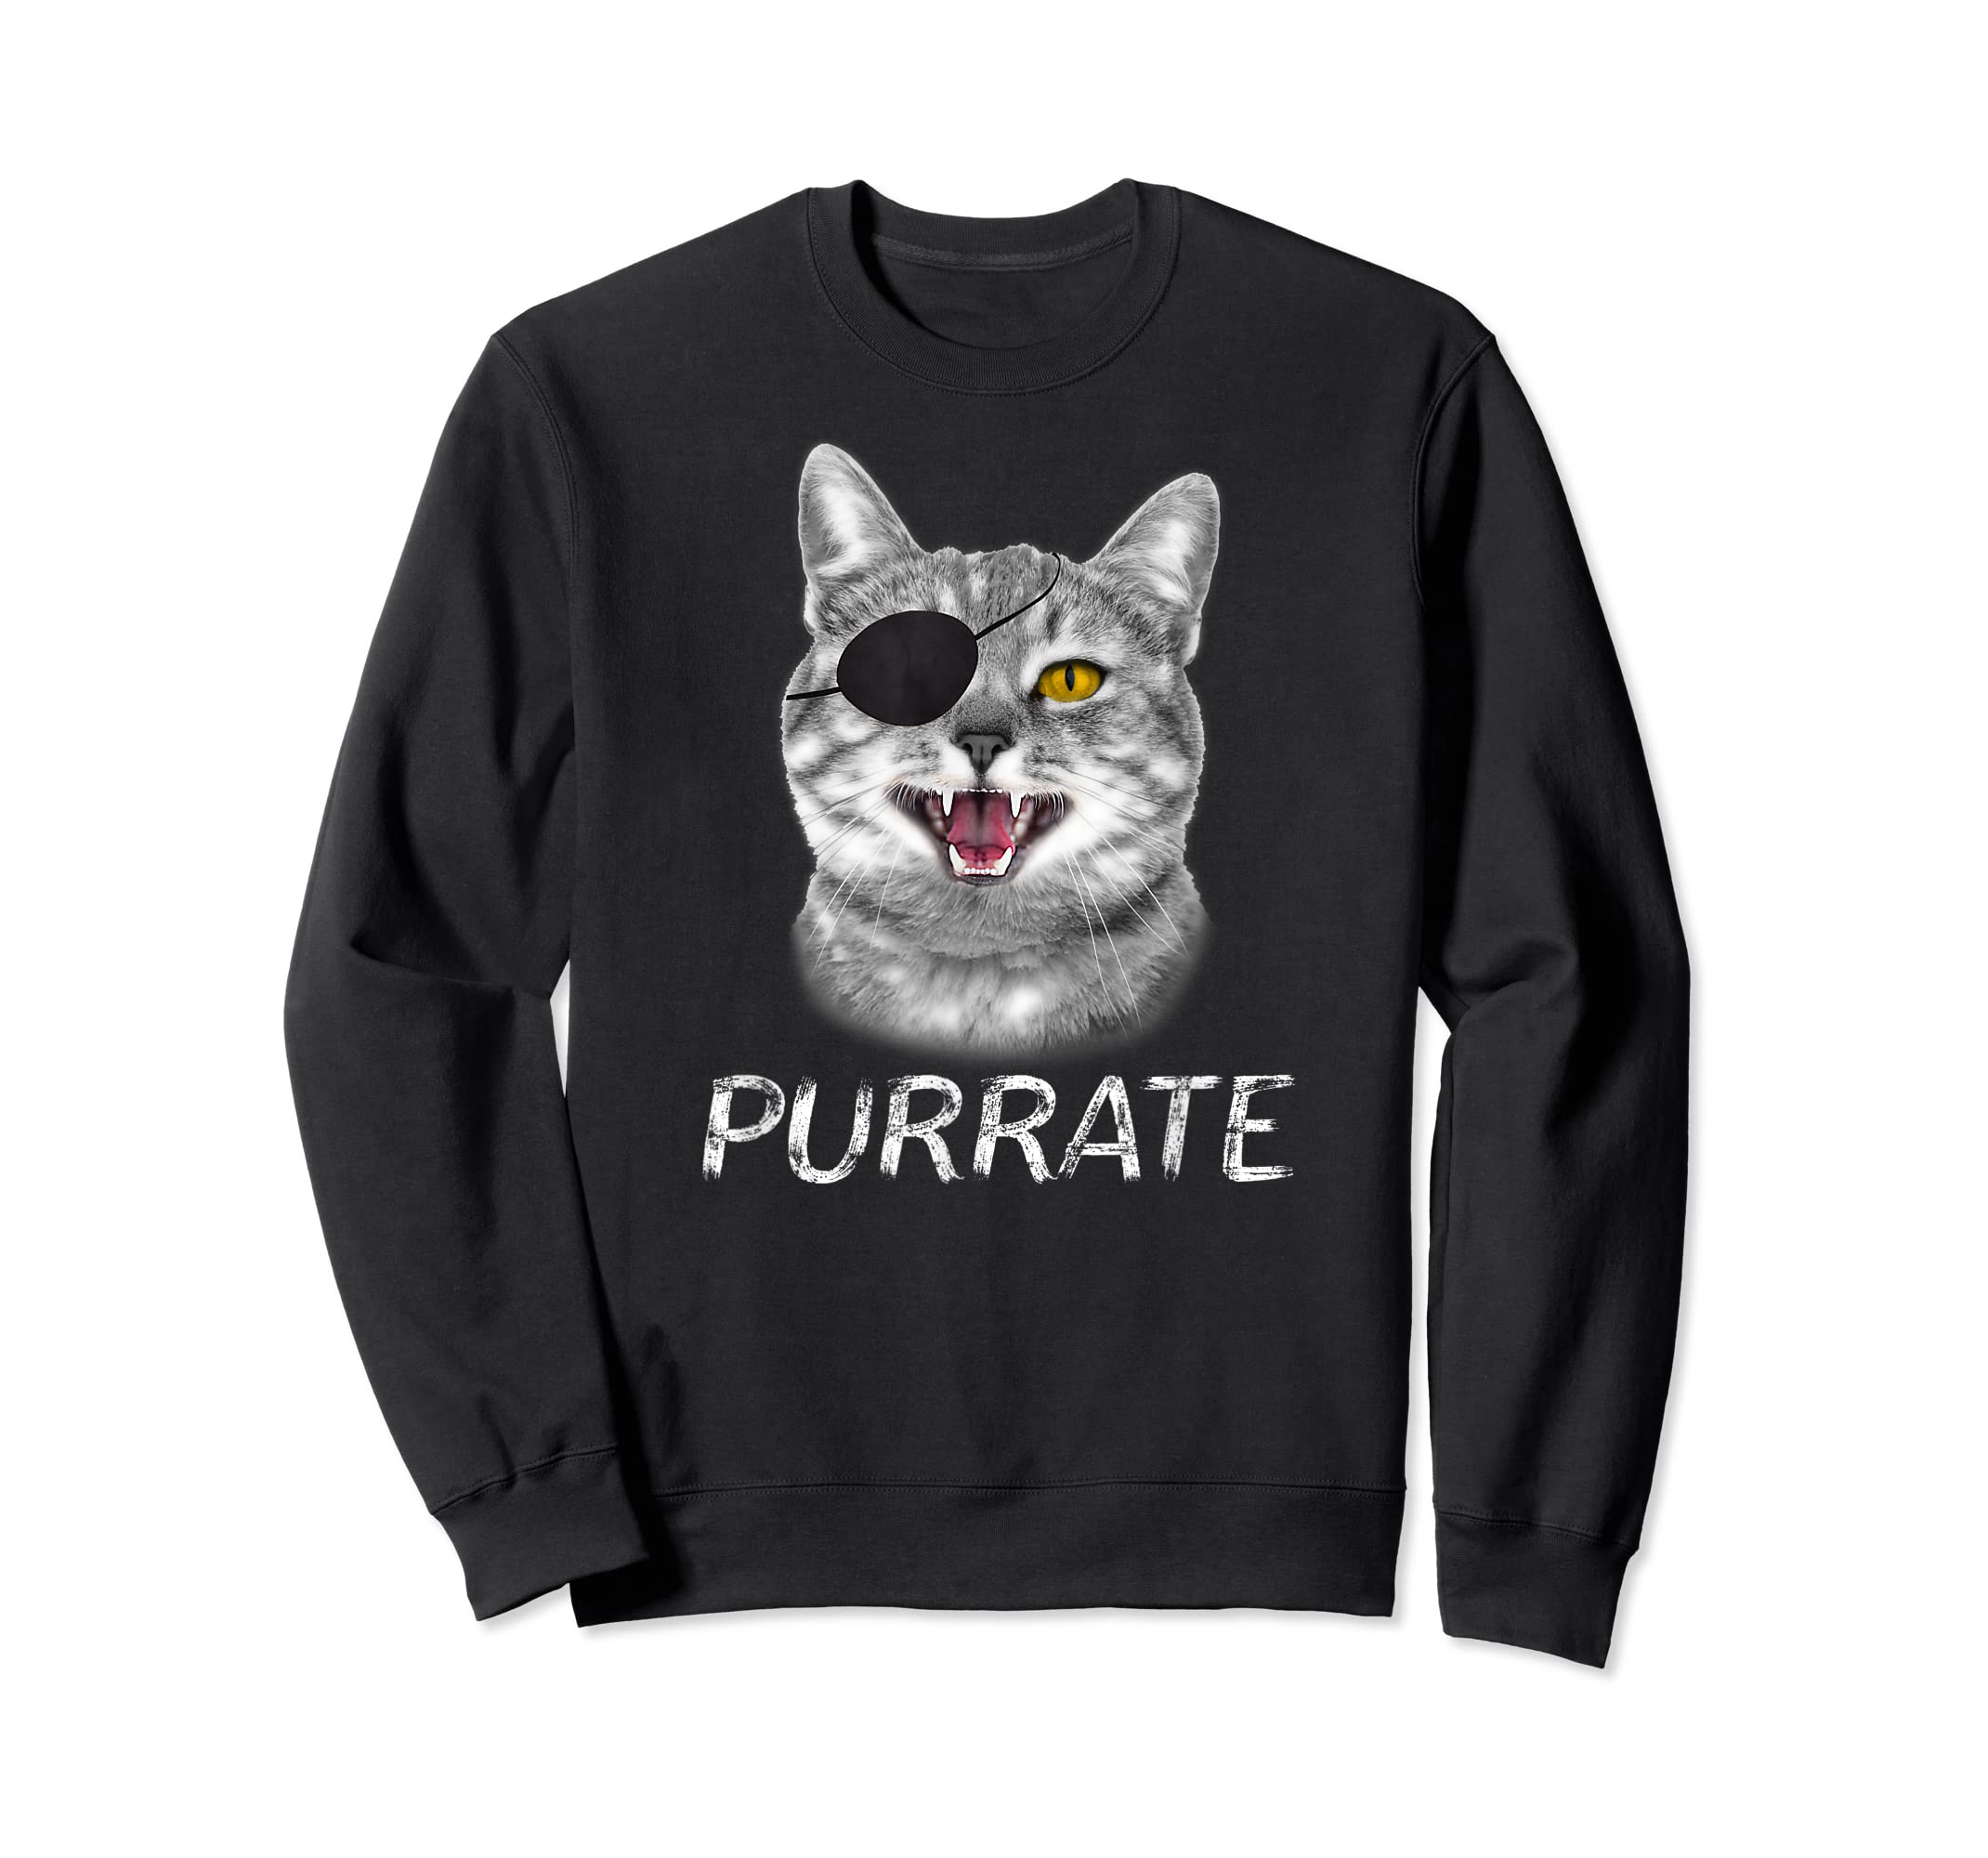 Halloween Trick Treat Cat Pirate Purrate T-Shirt-Sweatshirt-Black